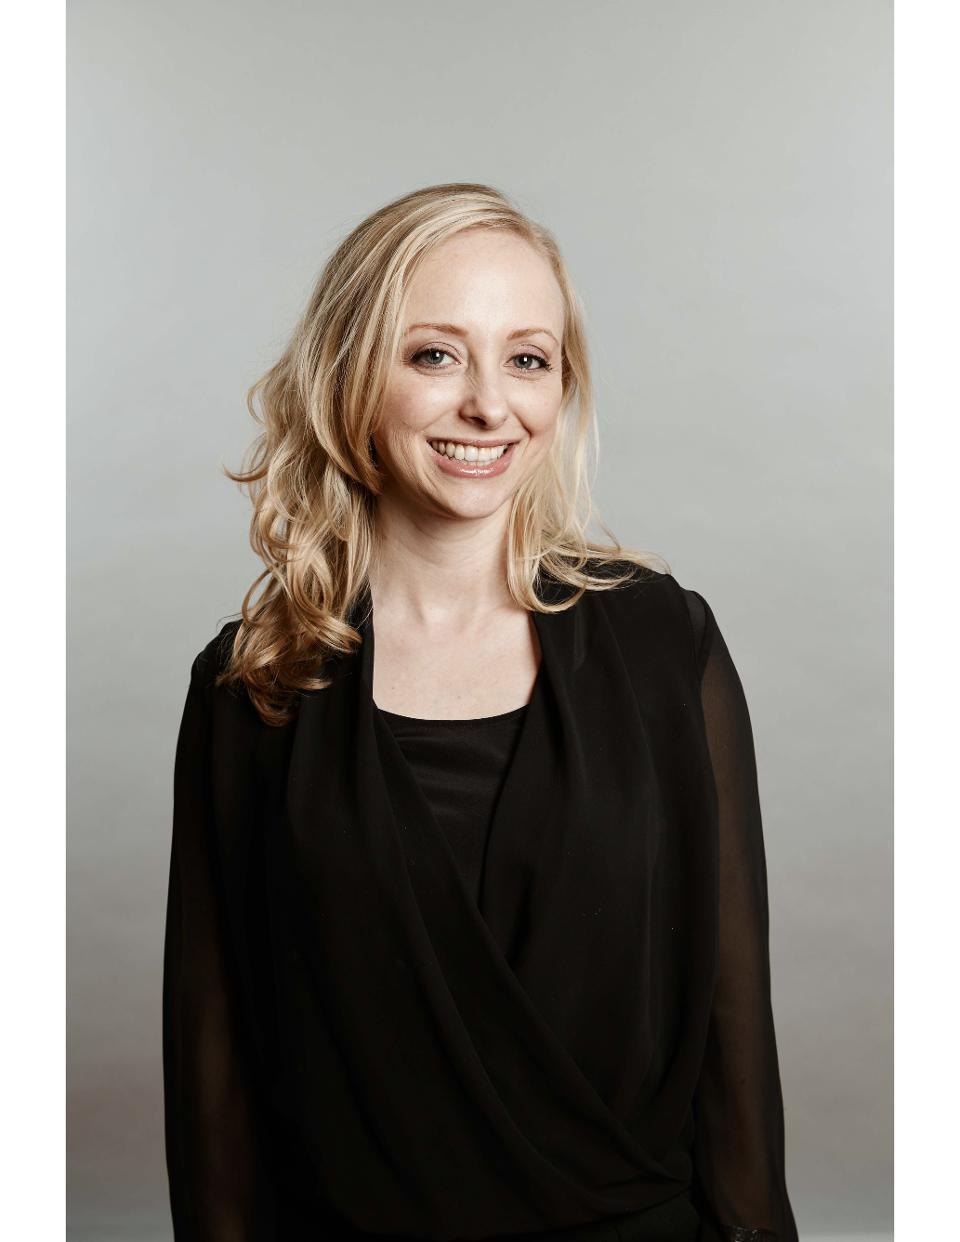 Marina Tarasova founded Paloma Health with her partner Guillaume Cohen-Skalli